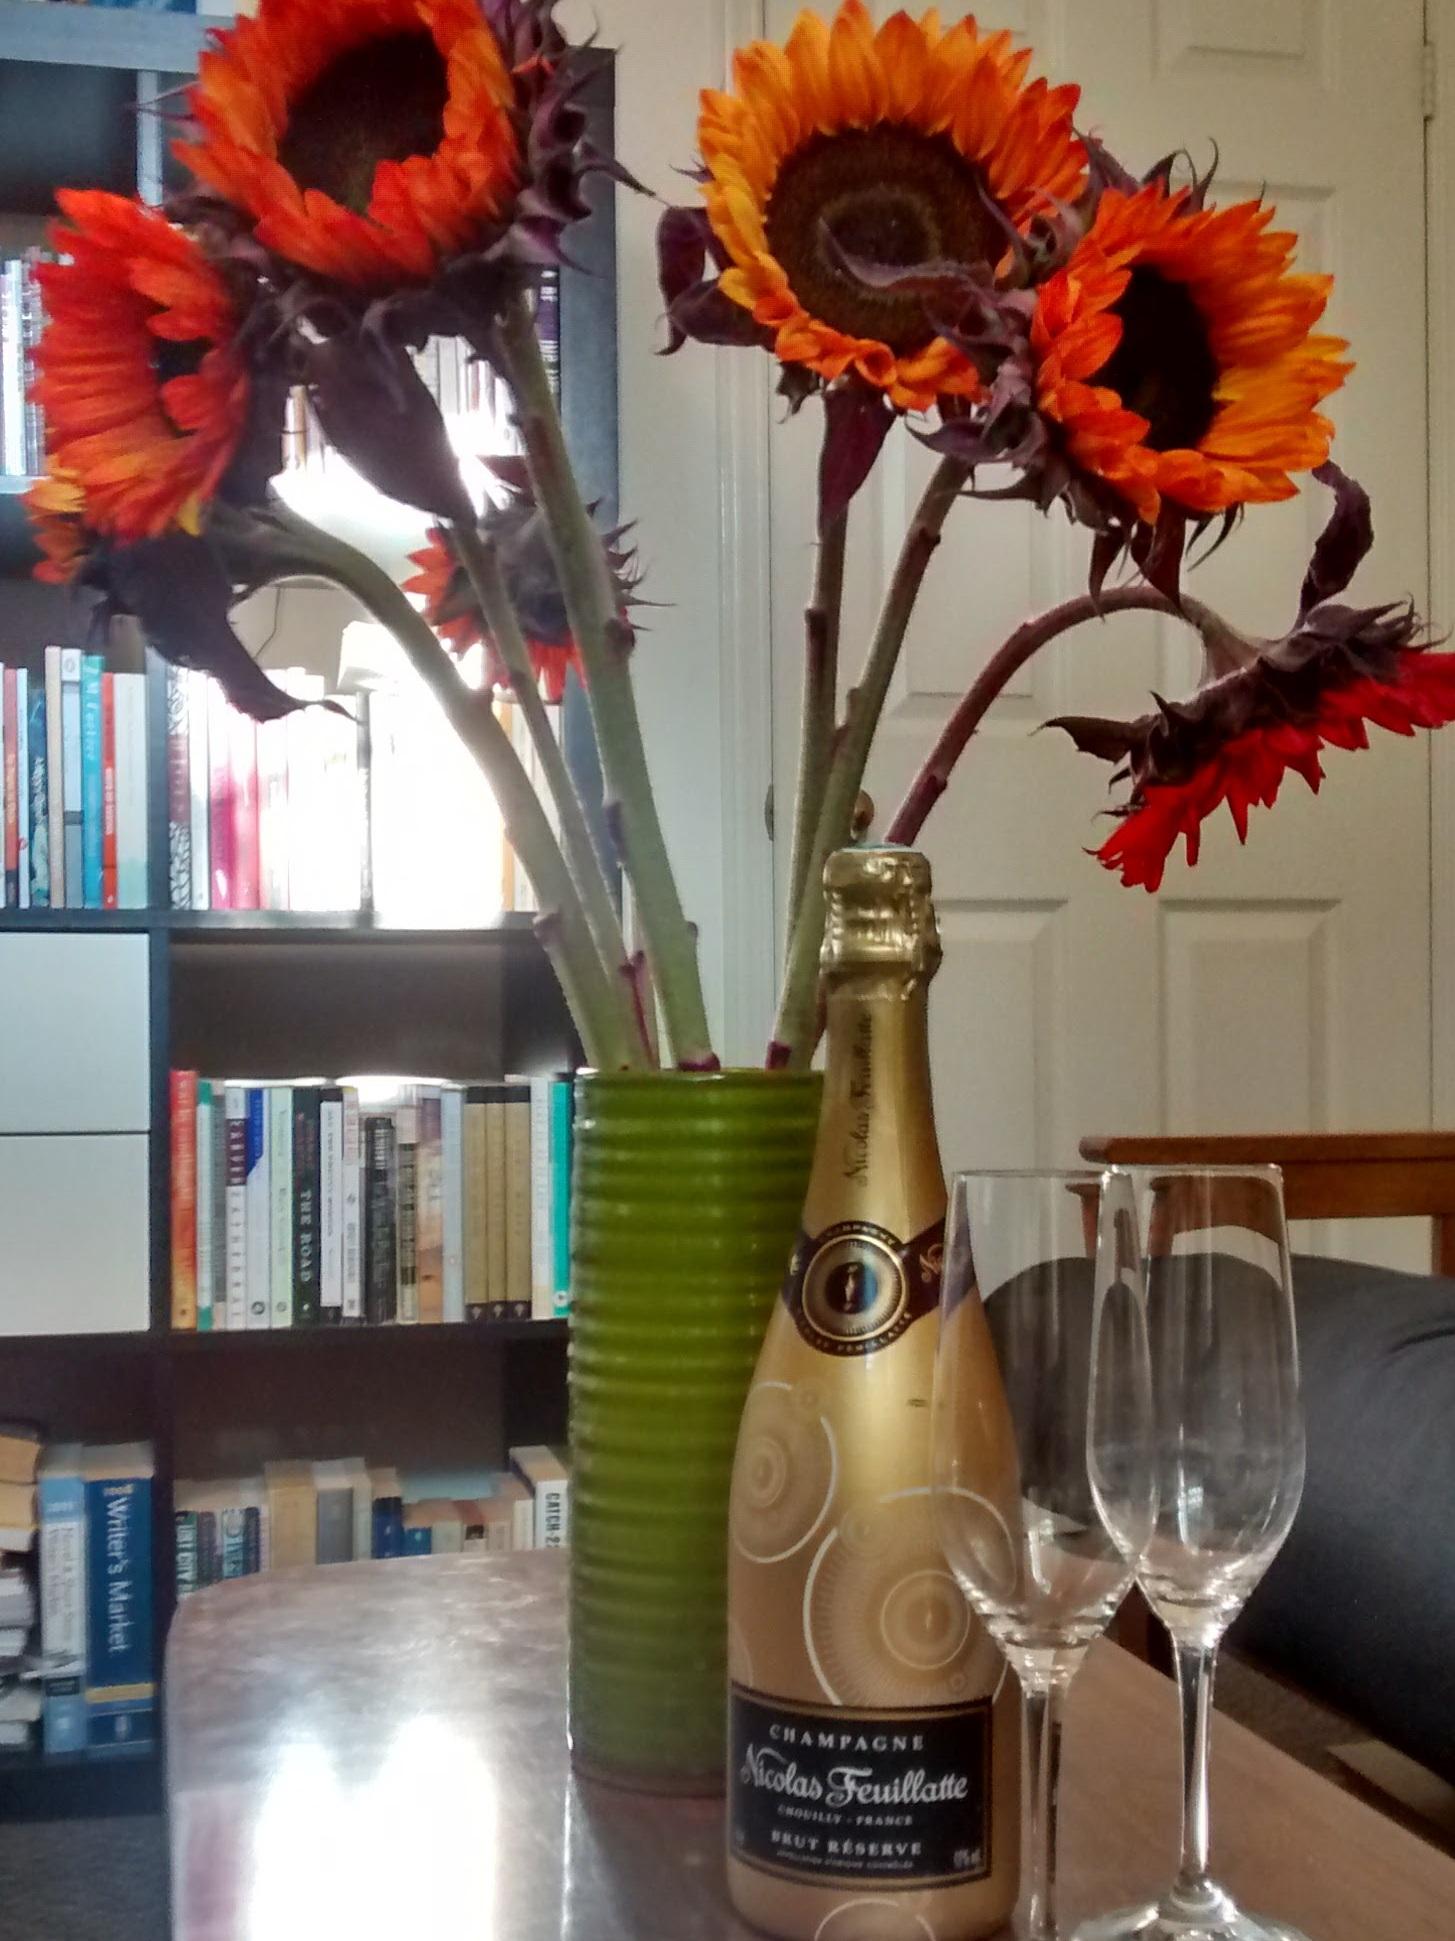 Celebrating beside my bookshelf!